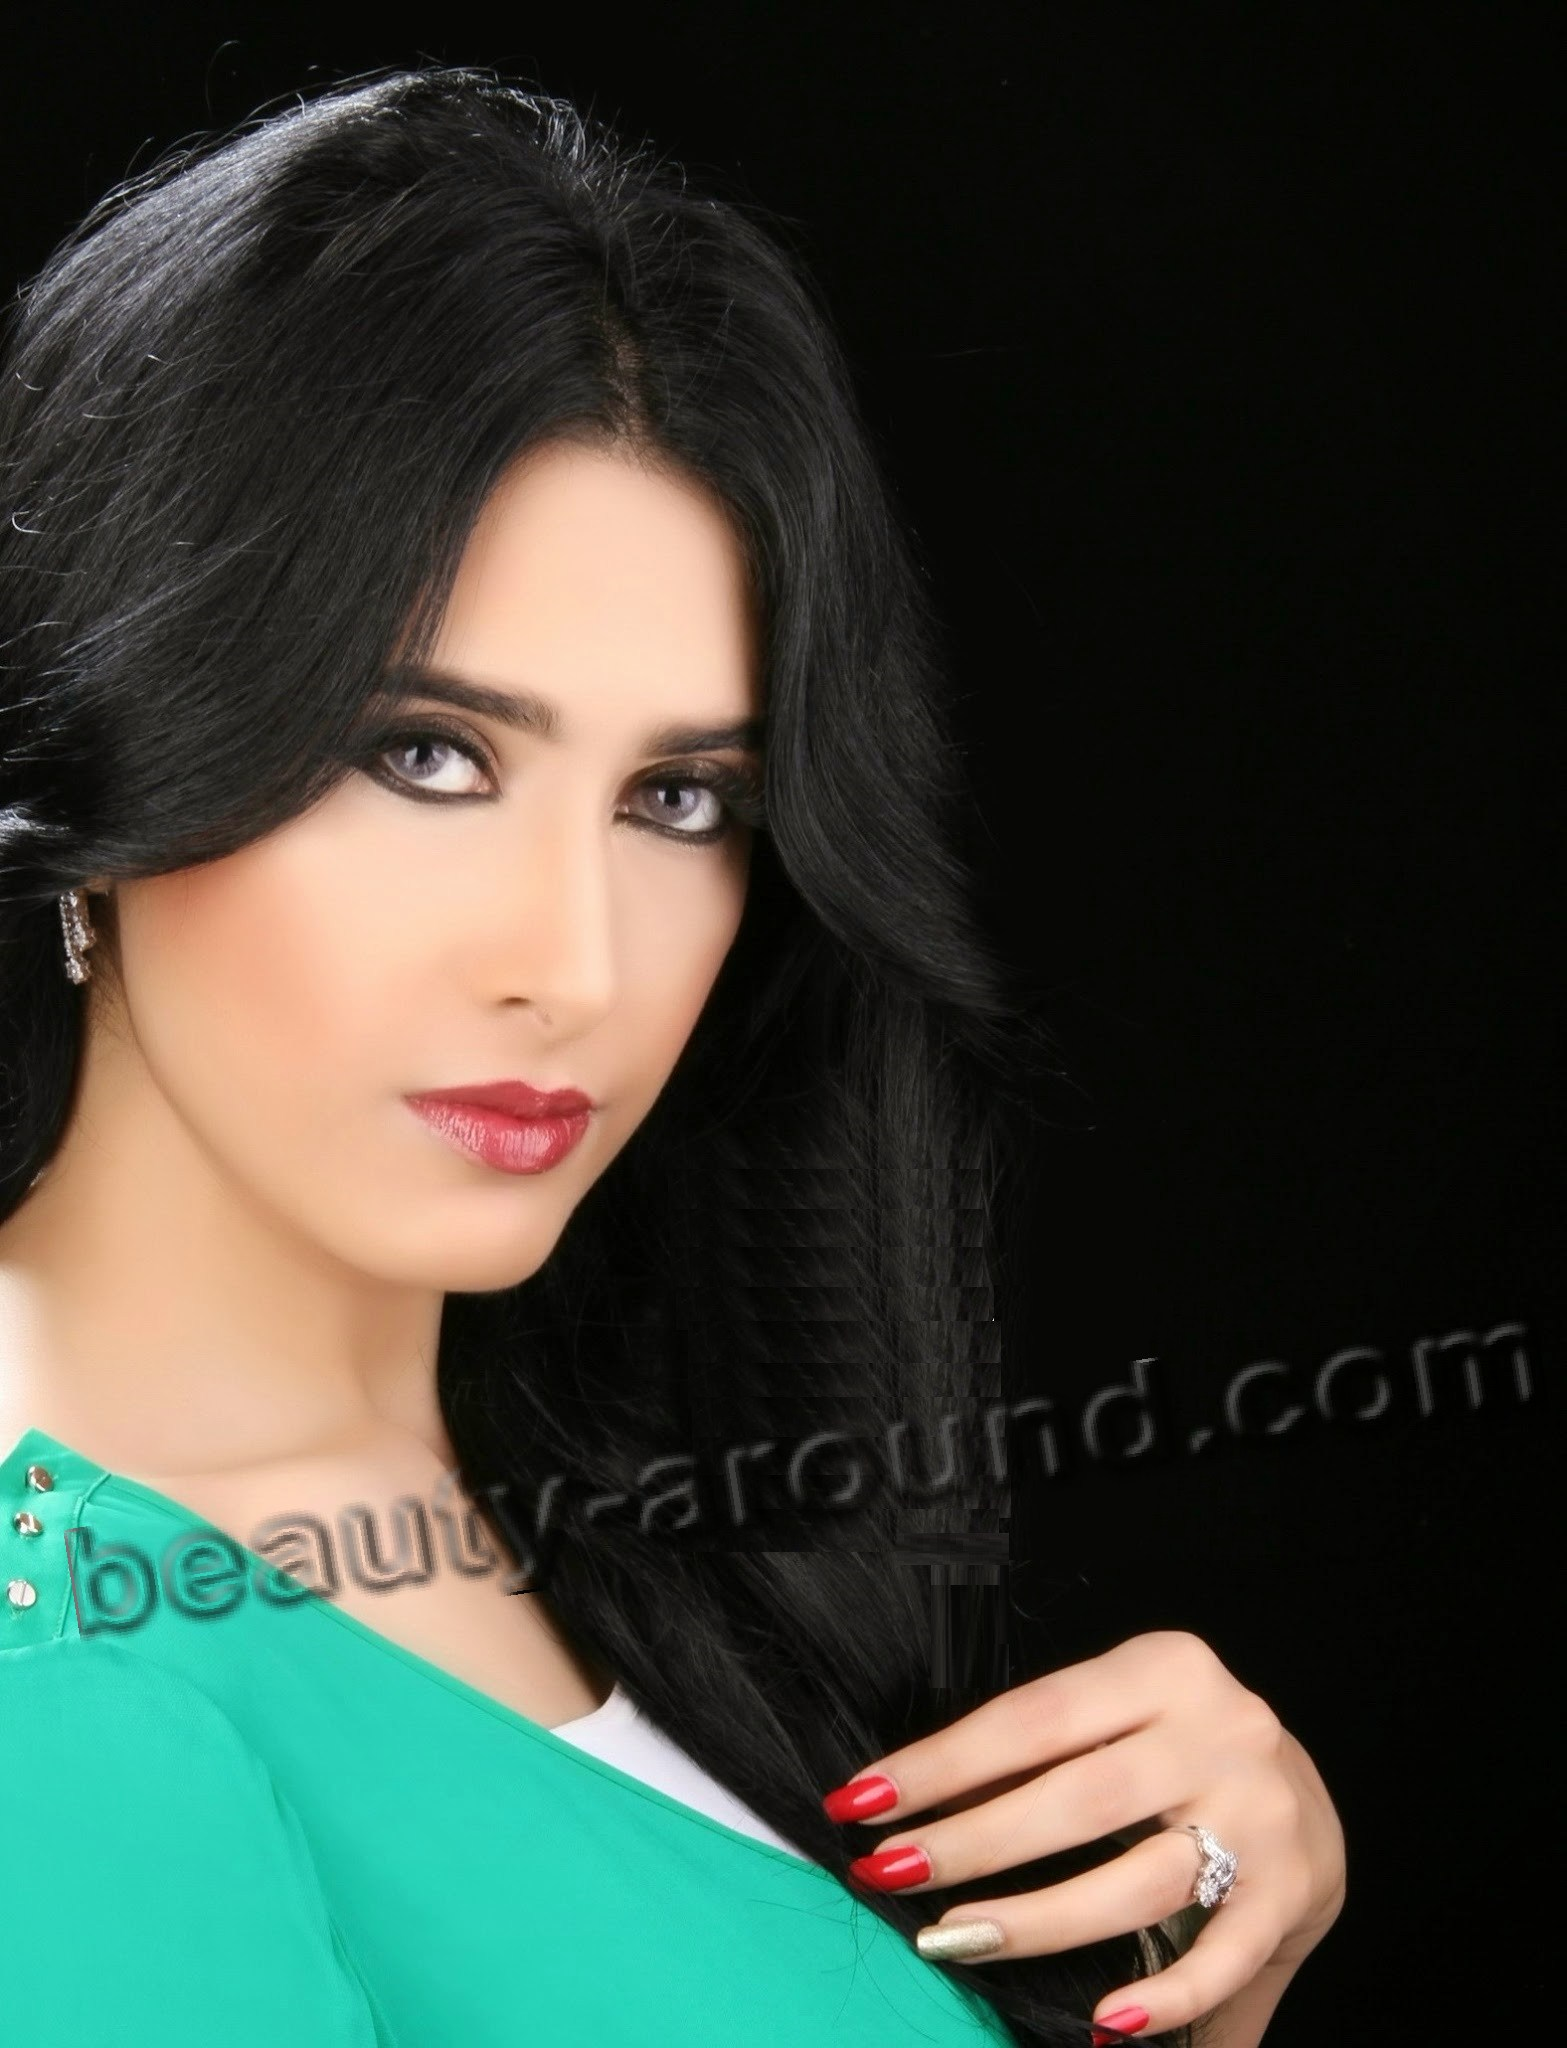 Rana al-Haddad красивая йеменская певица фото